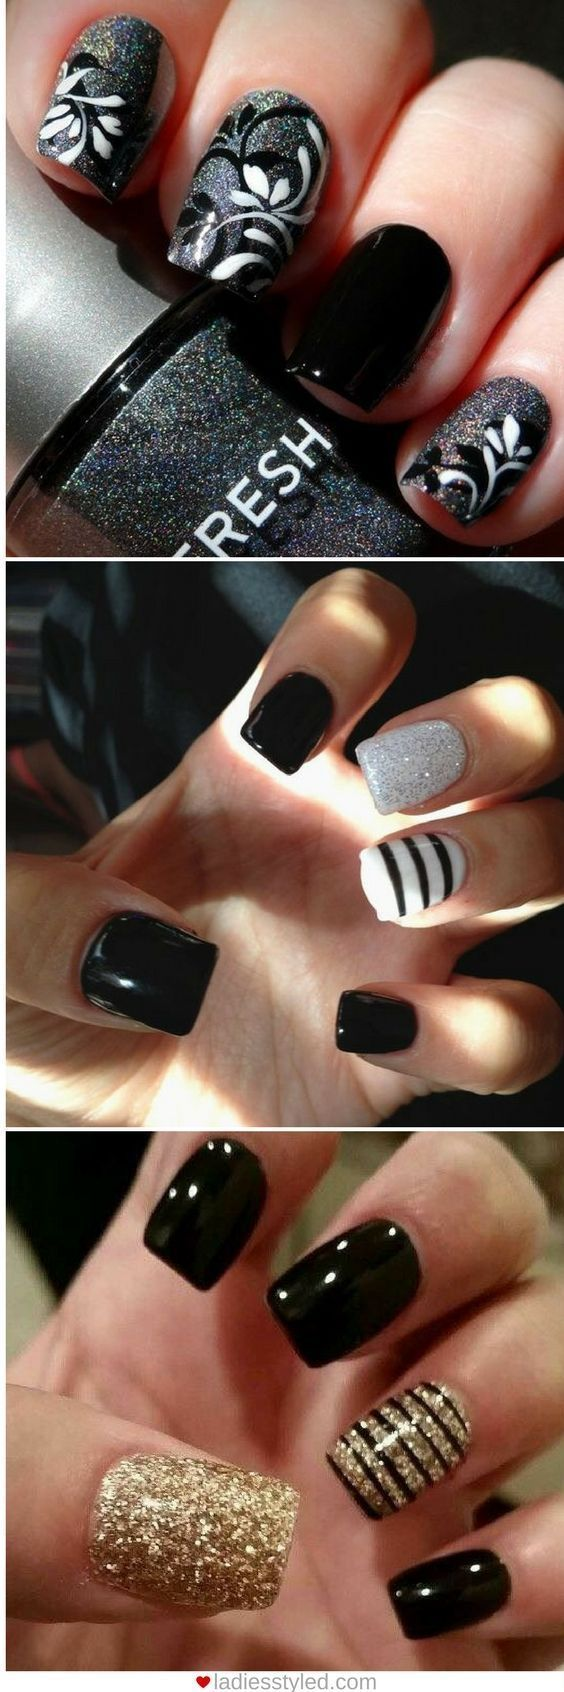 1123 best Nails Inspo images on Pinterest | Cute nails, Belle nails ...